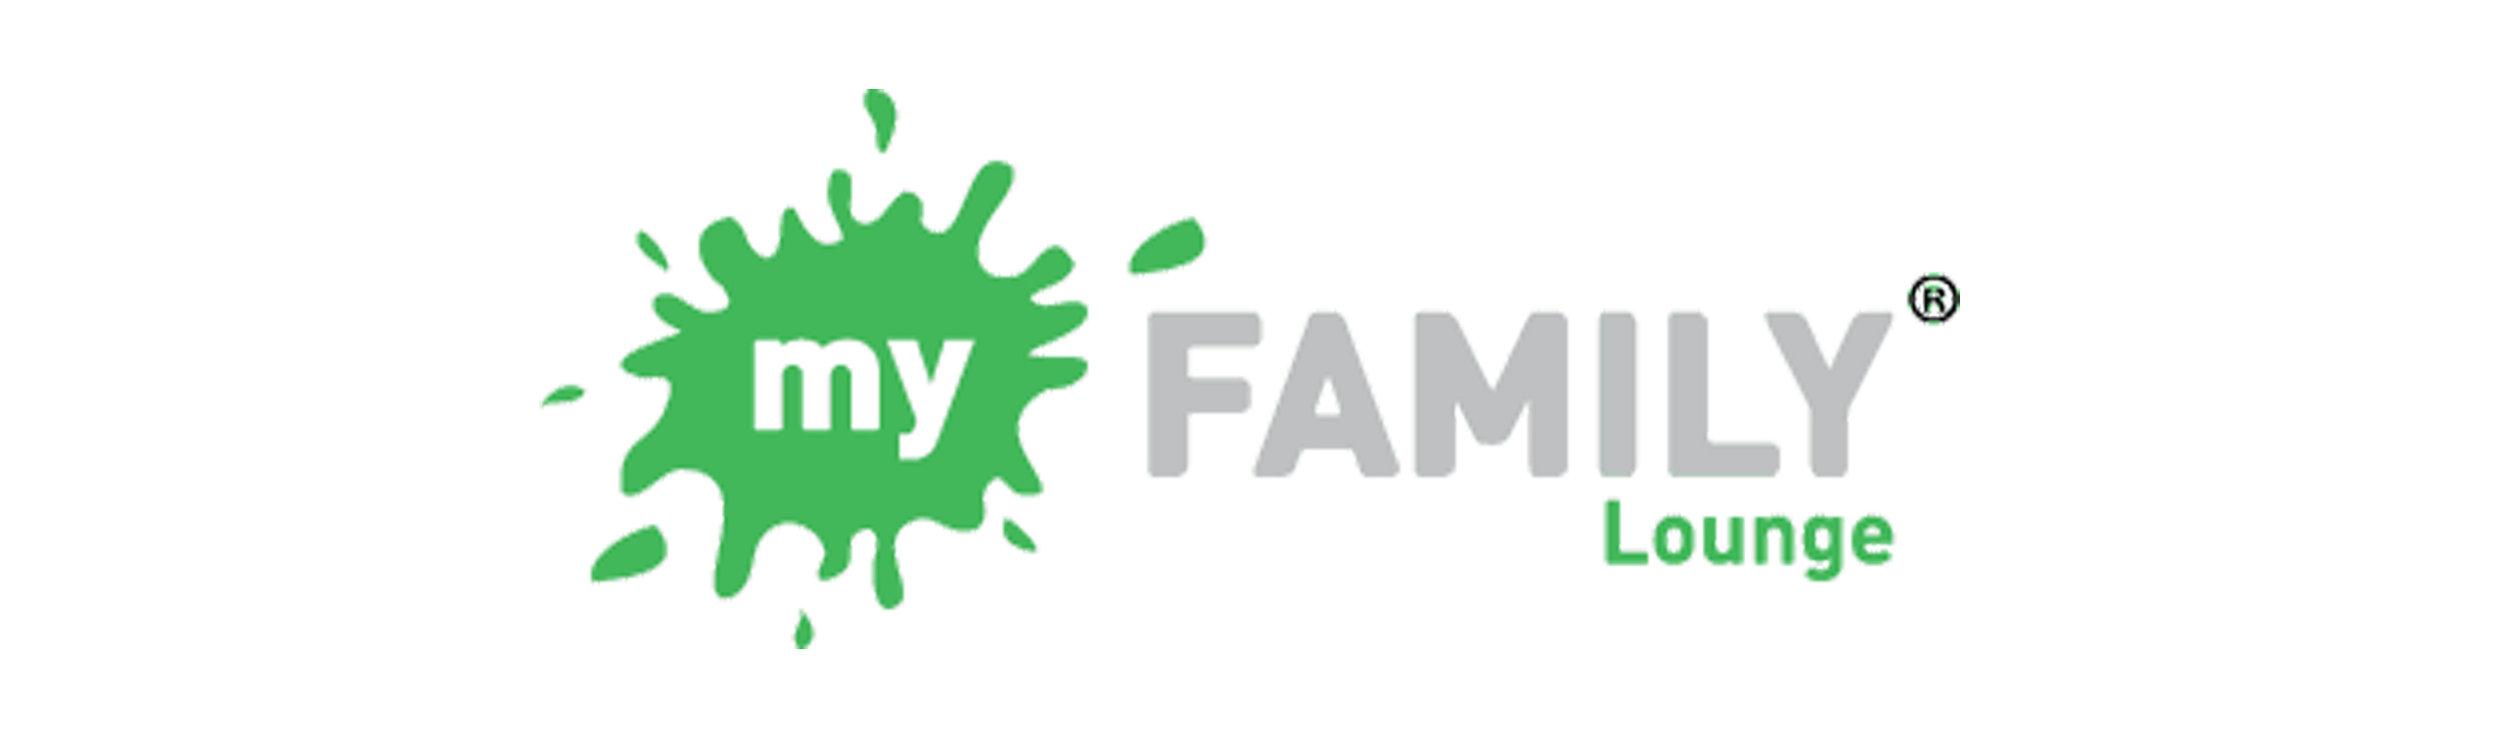 myfamilylounge_logo_Final.jpg